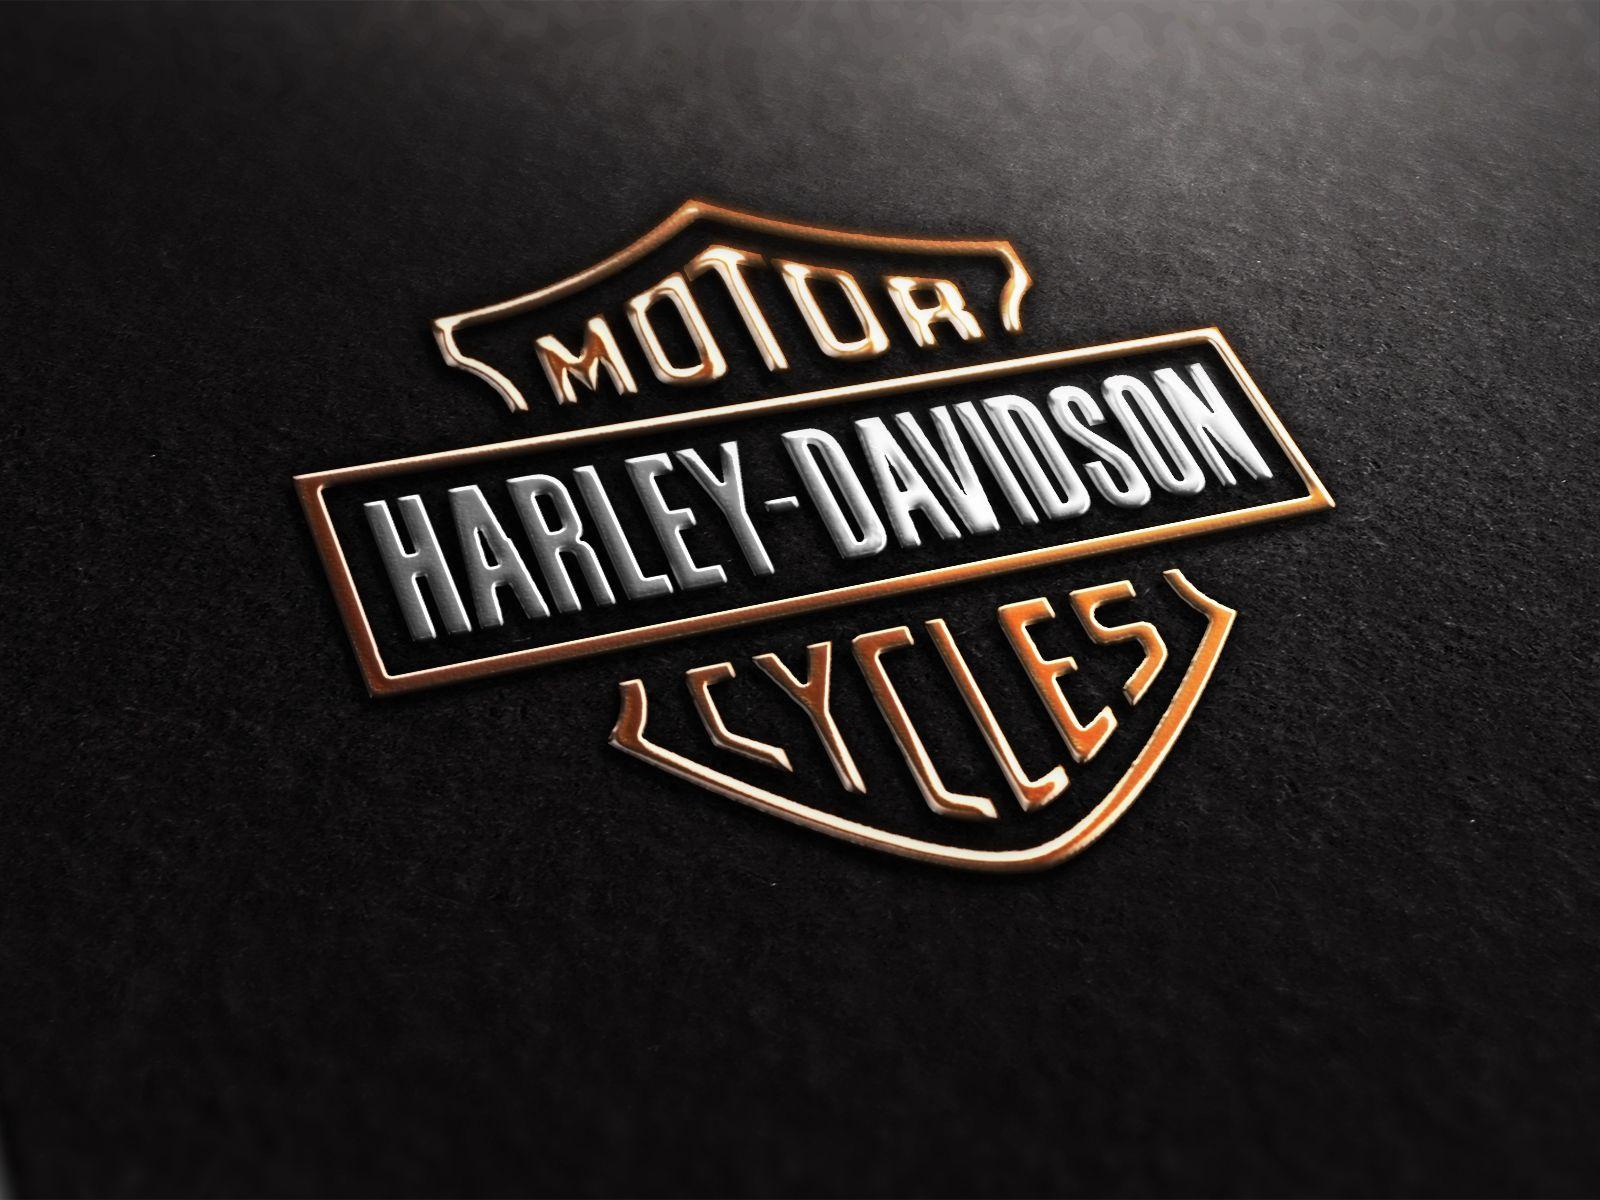 logo harley davidson wallpaper.